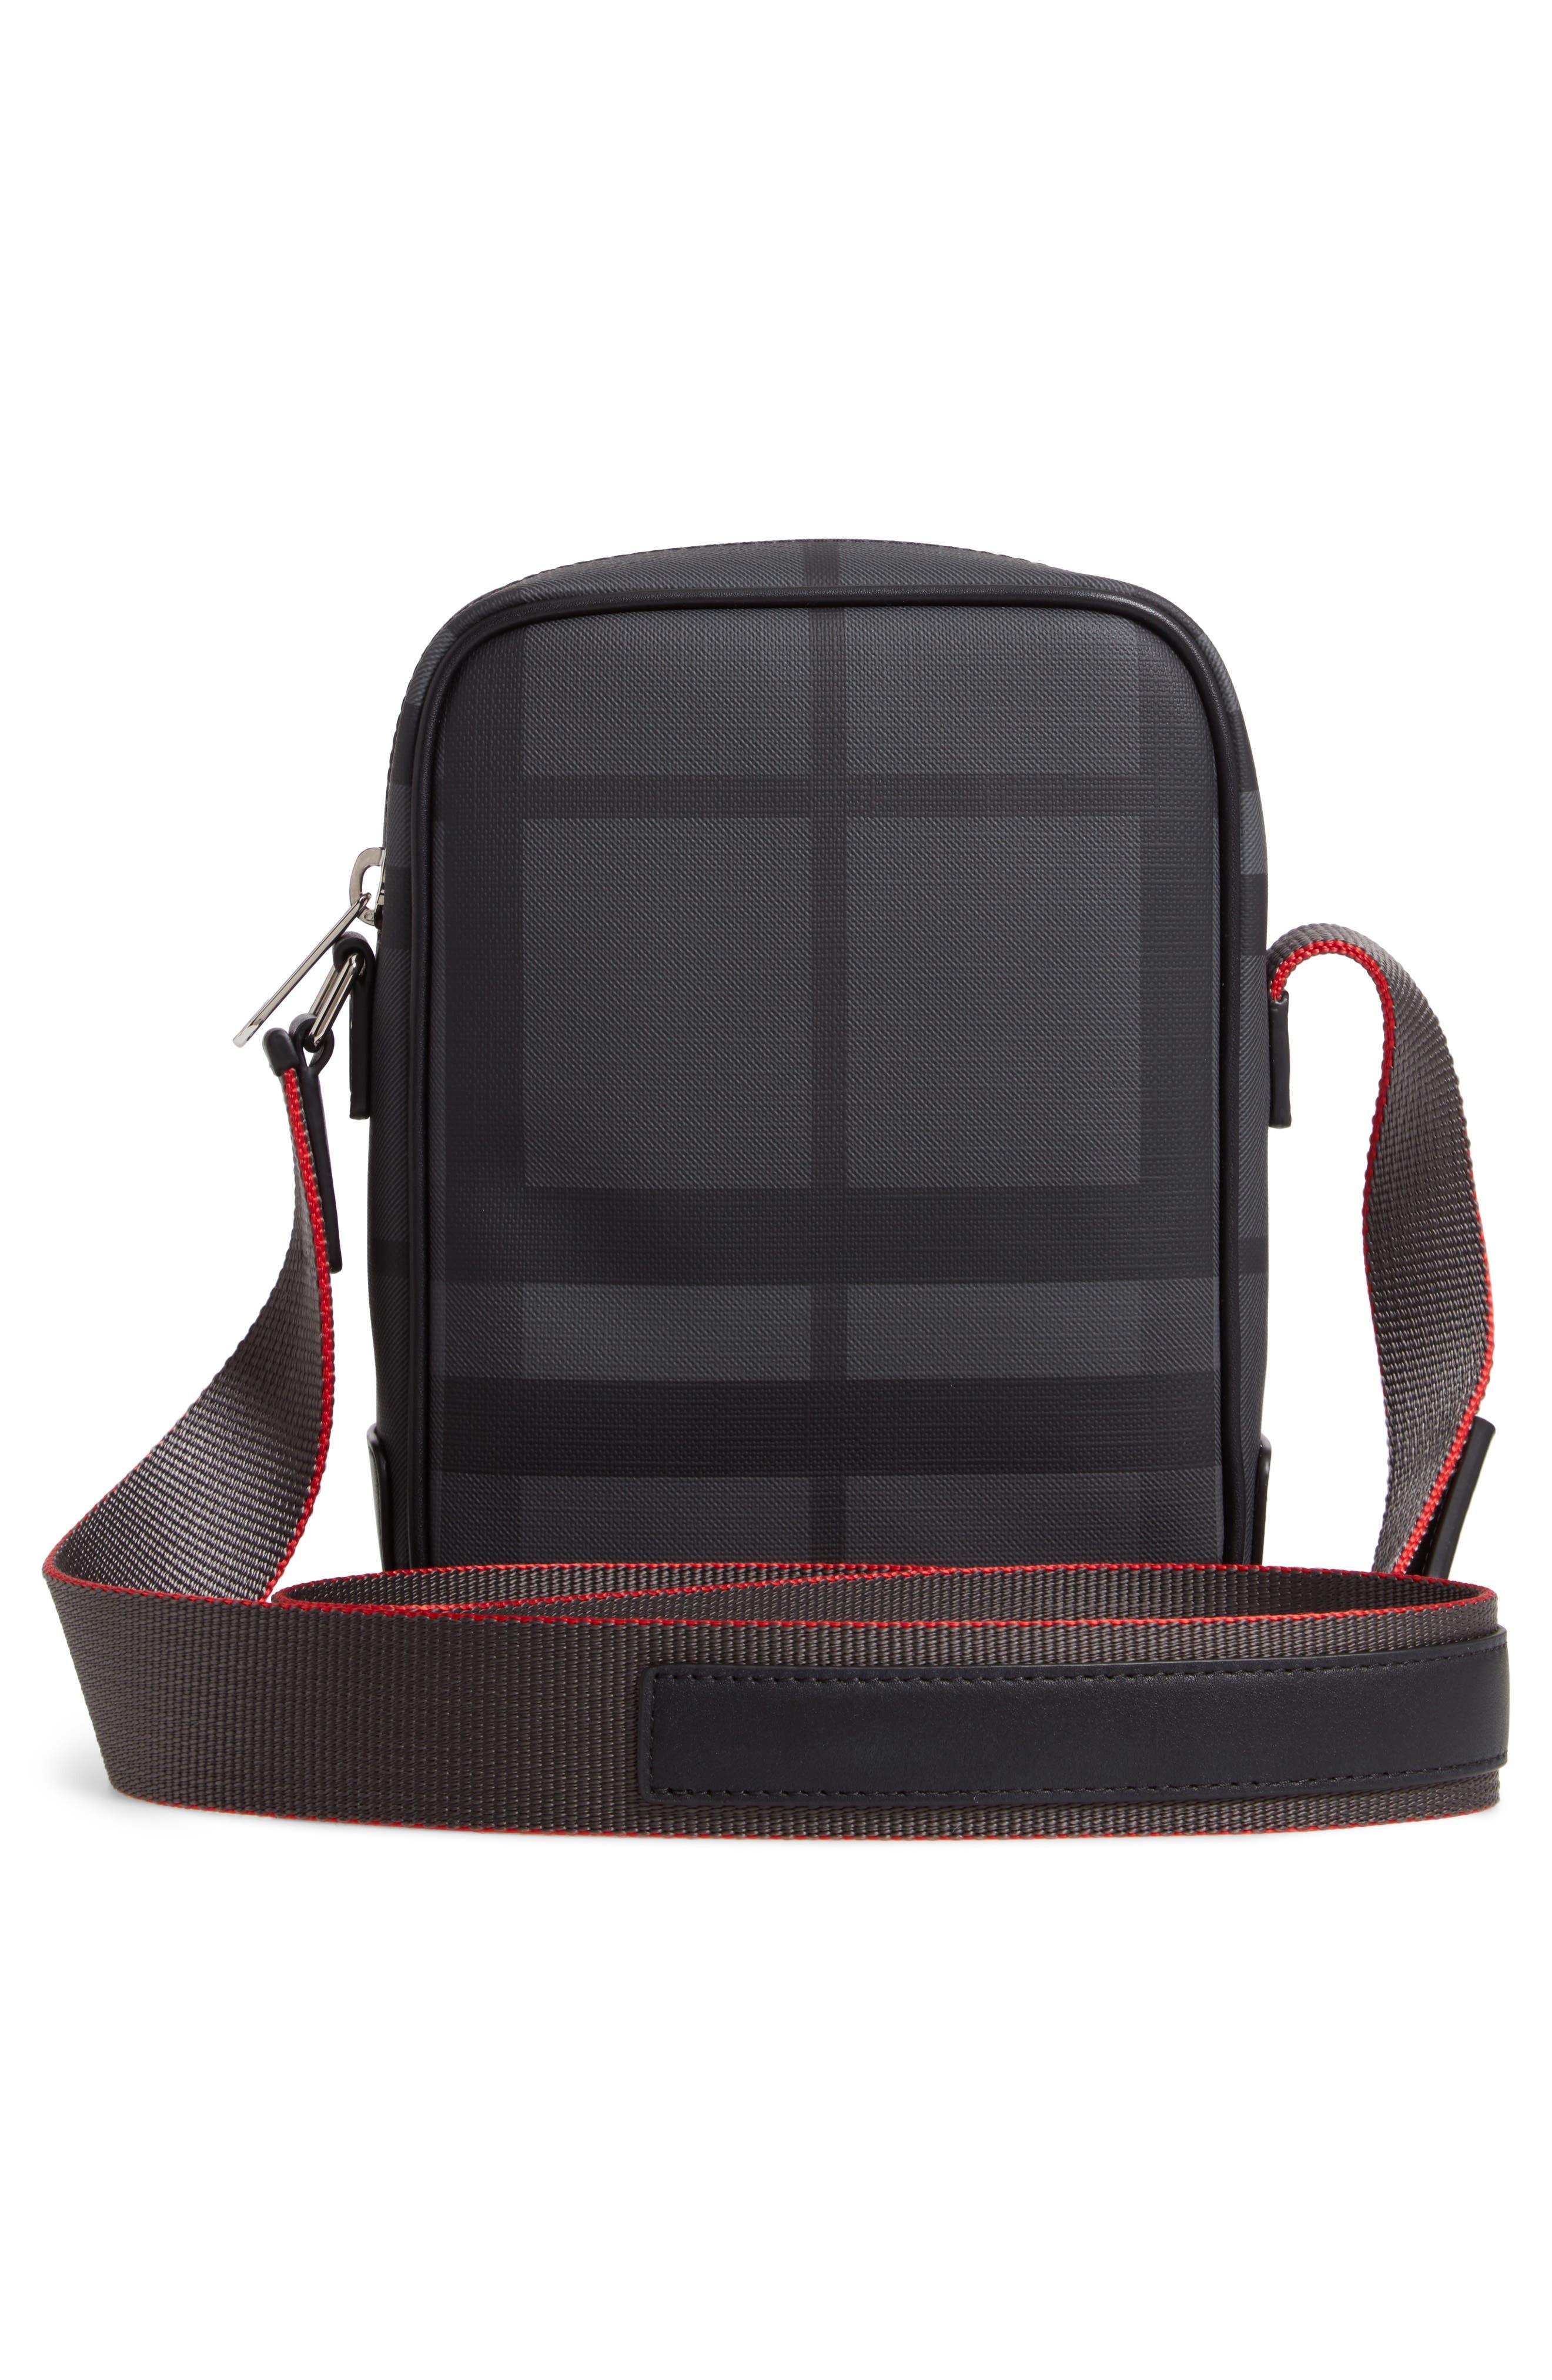 Freddie London Check Compact Messenger Bag,                             Alternate thumbnail 3, color,                             CHARCOAL BLACK